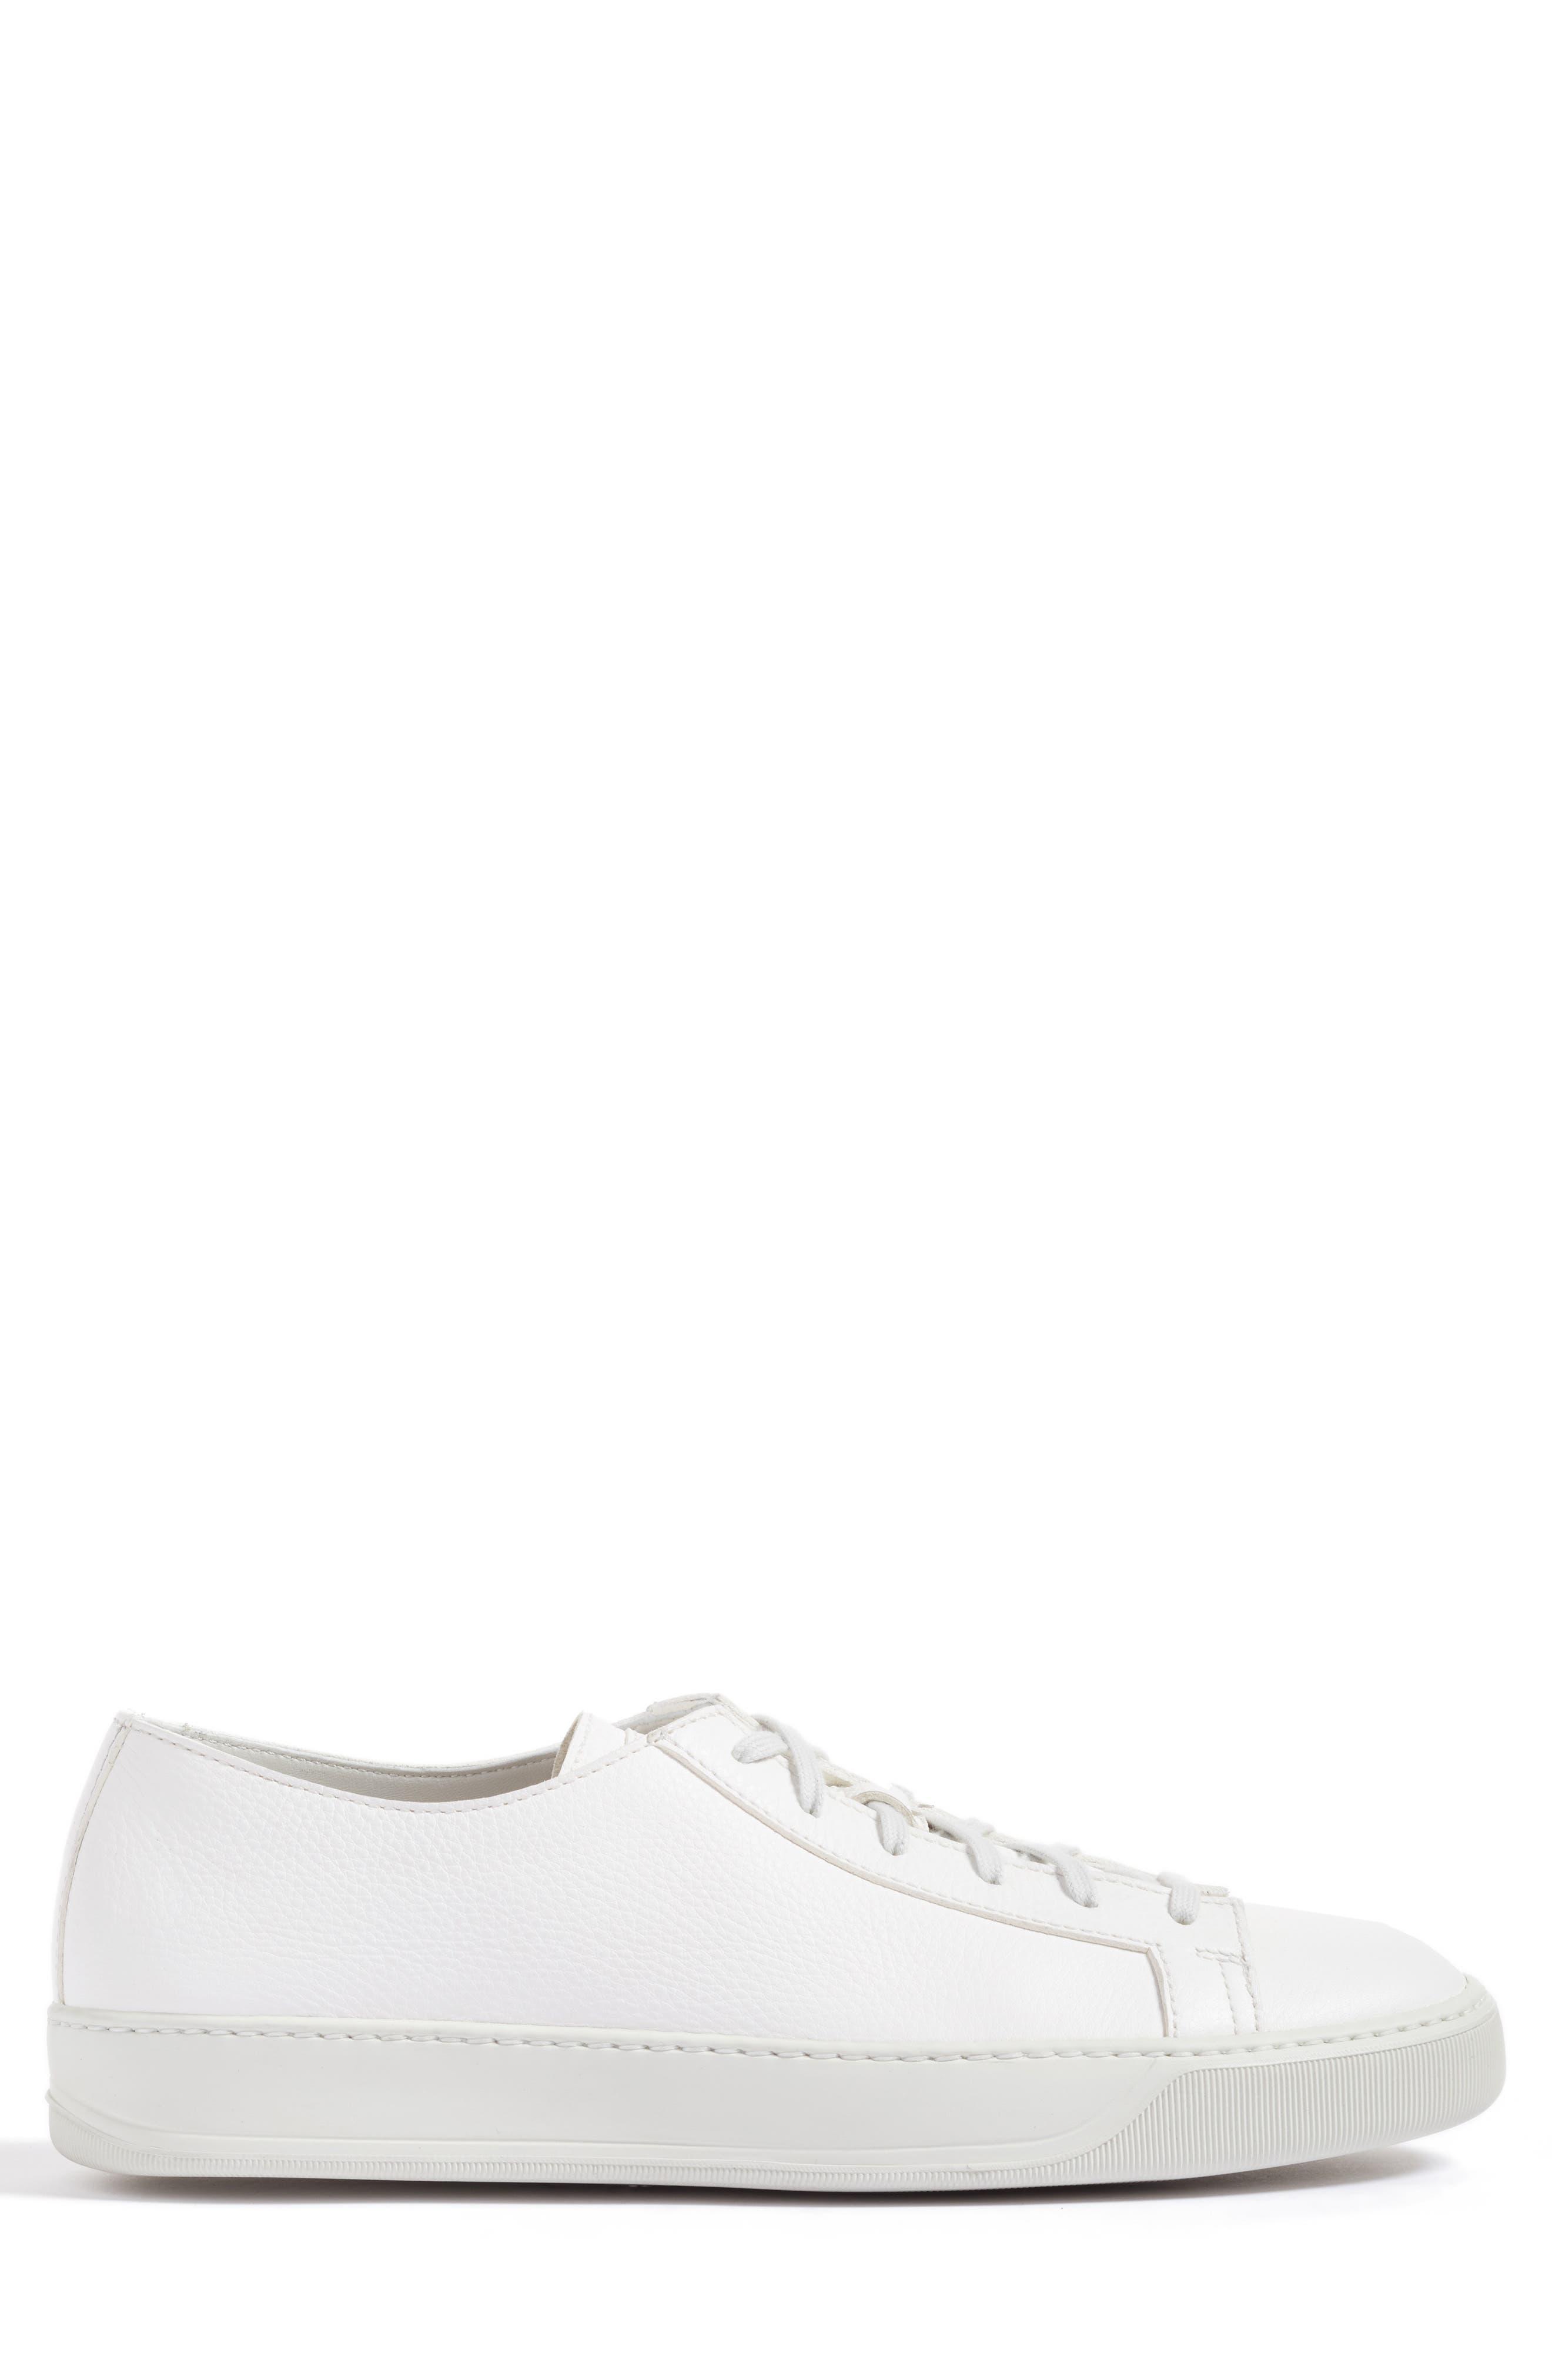 Cleanic Sneaker,                             Alternate thumbnail 12, color,